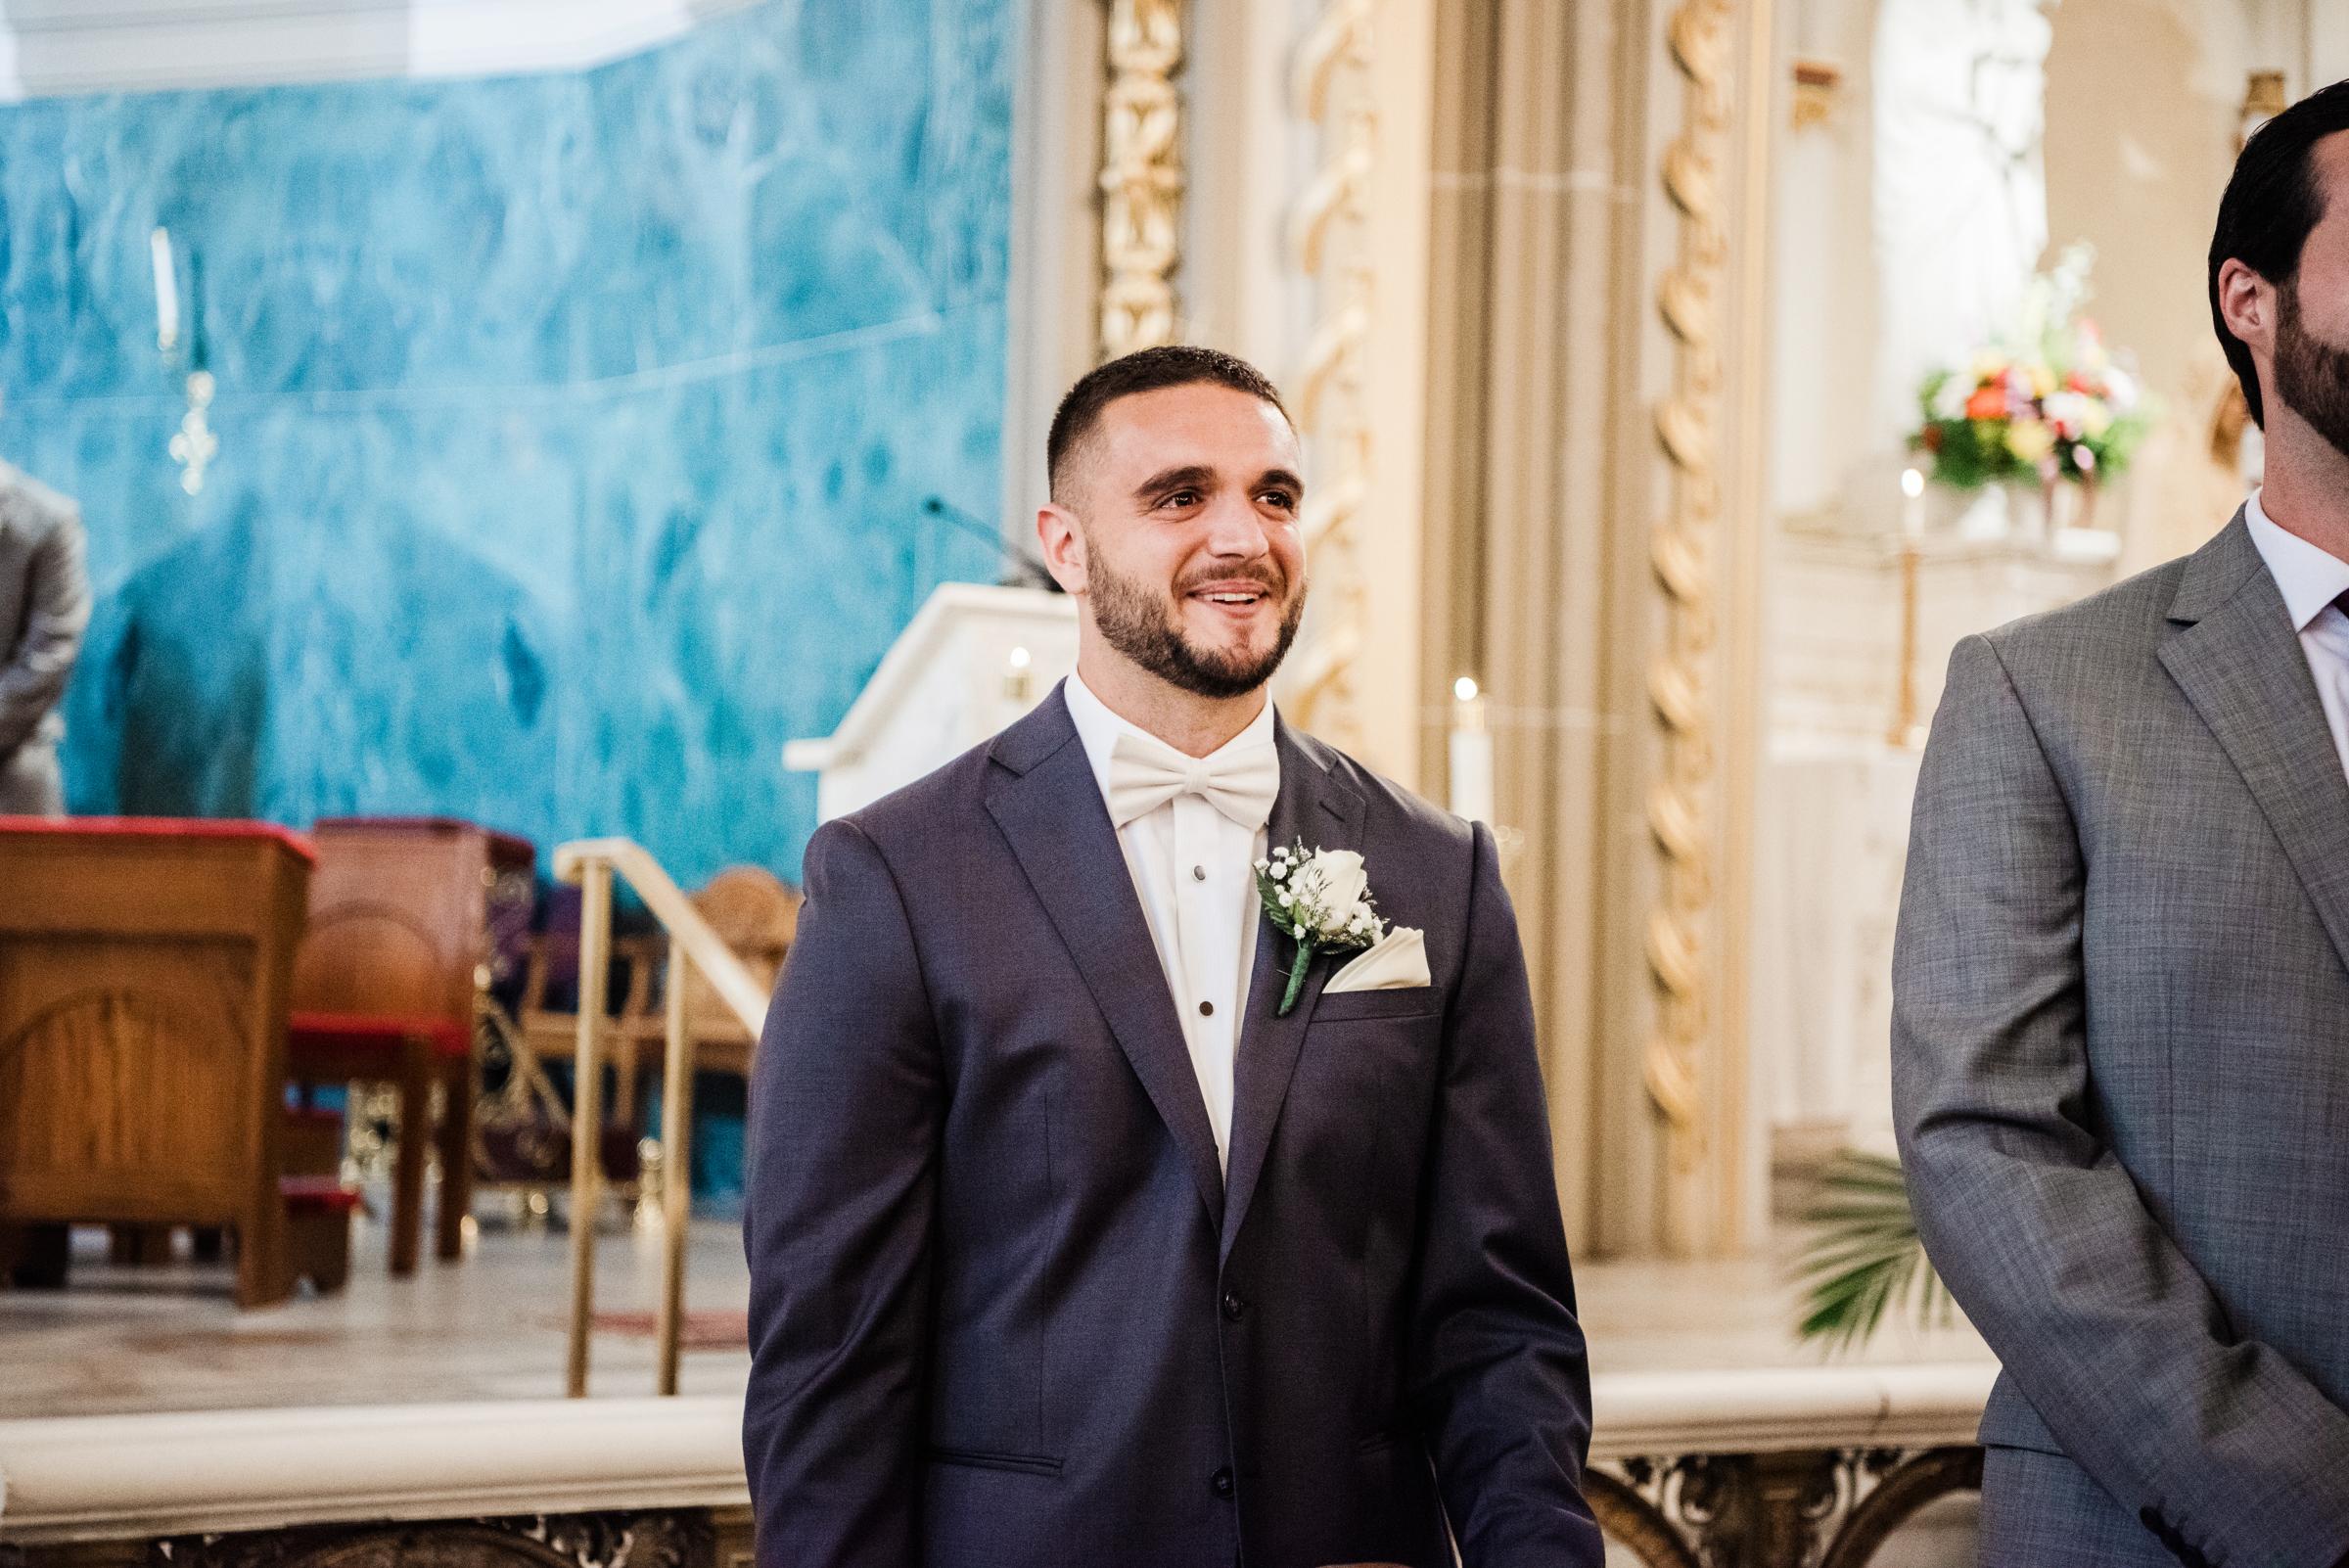 Historic_Old_St_Johns_Church_Valentinos_Banquet_Hall_Central_NY_Wedding_JILL_STUDIO_Rochester_NY_Photographer_DSC_5706.jpg